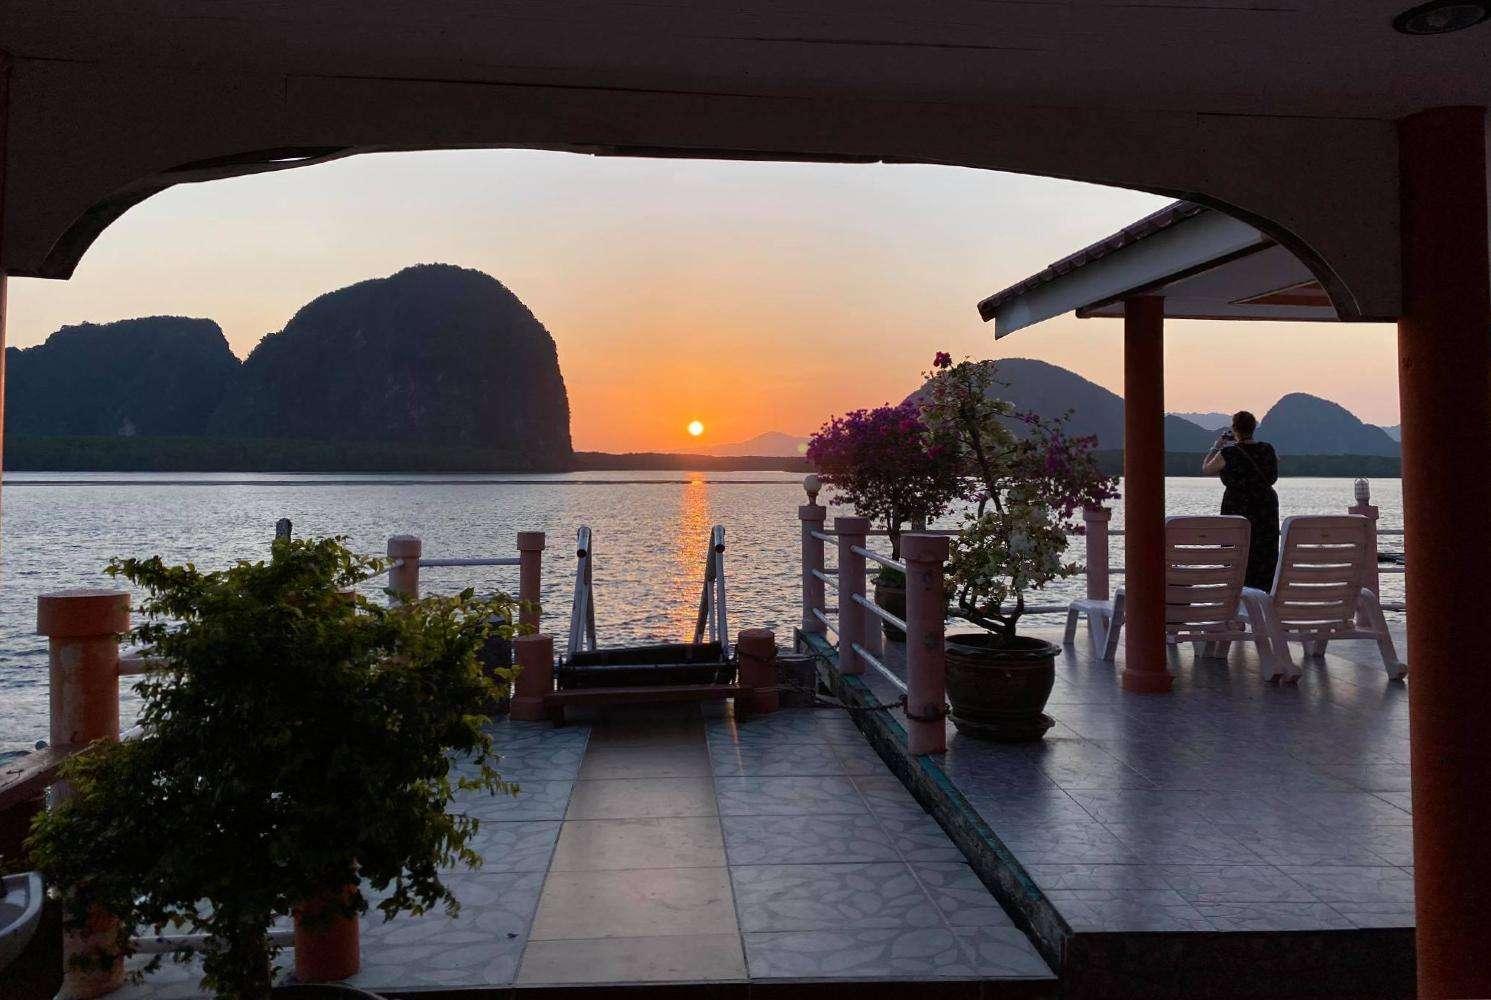 Uitzicht vanaf James Bond Bungalow op Koh Panyee in Phang Nga Bay, Thailand